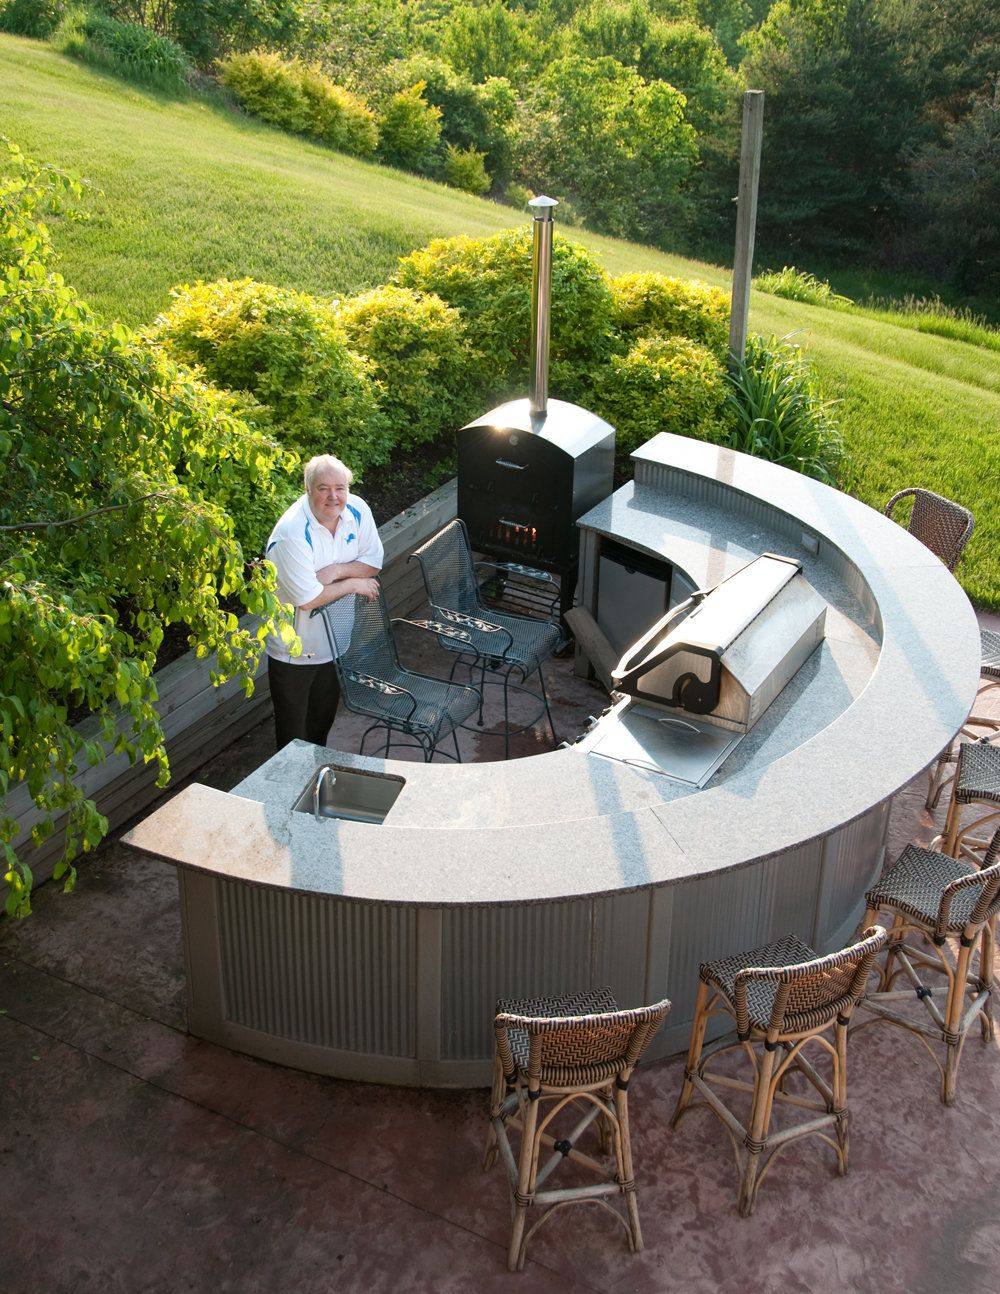 Best Outdoor Kitchens A Growing Trend Diy Outdoor Kitchen 400 x 300